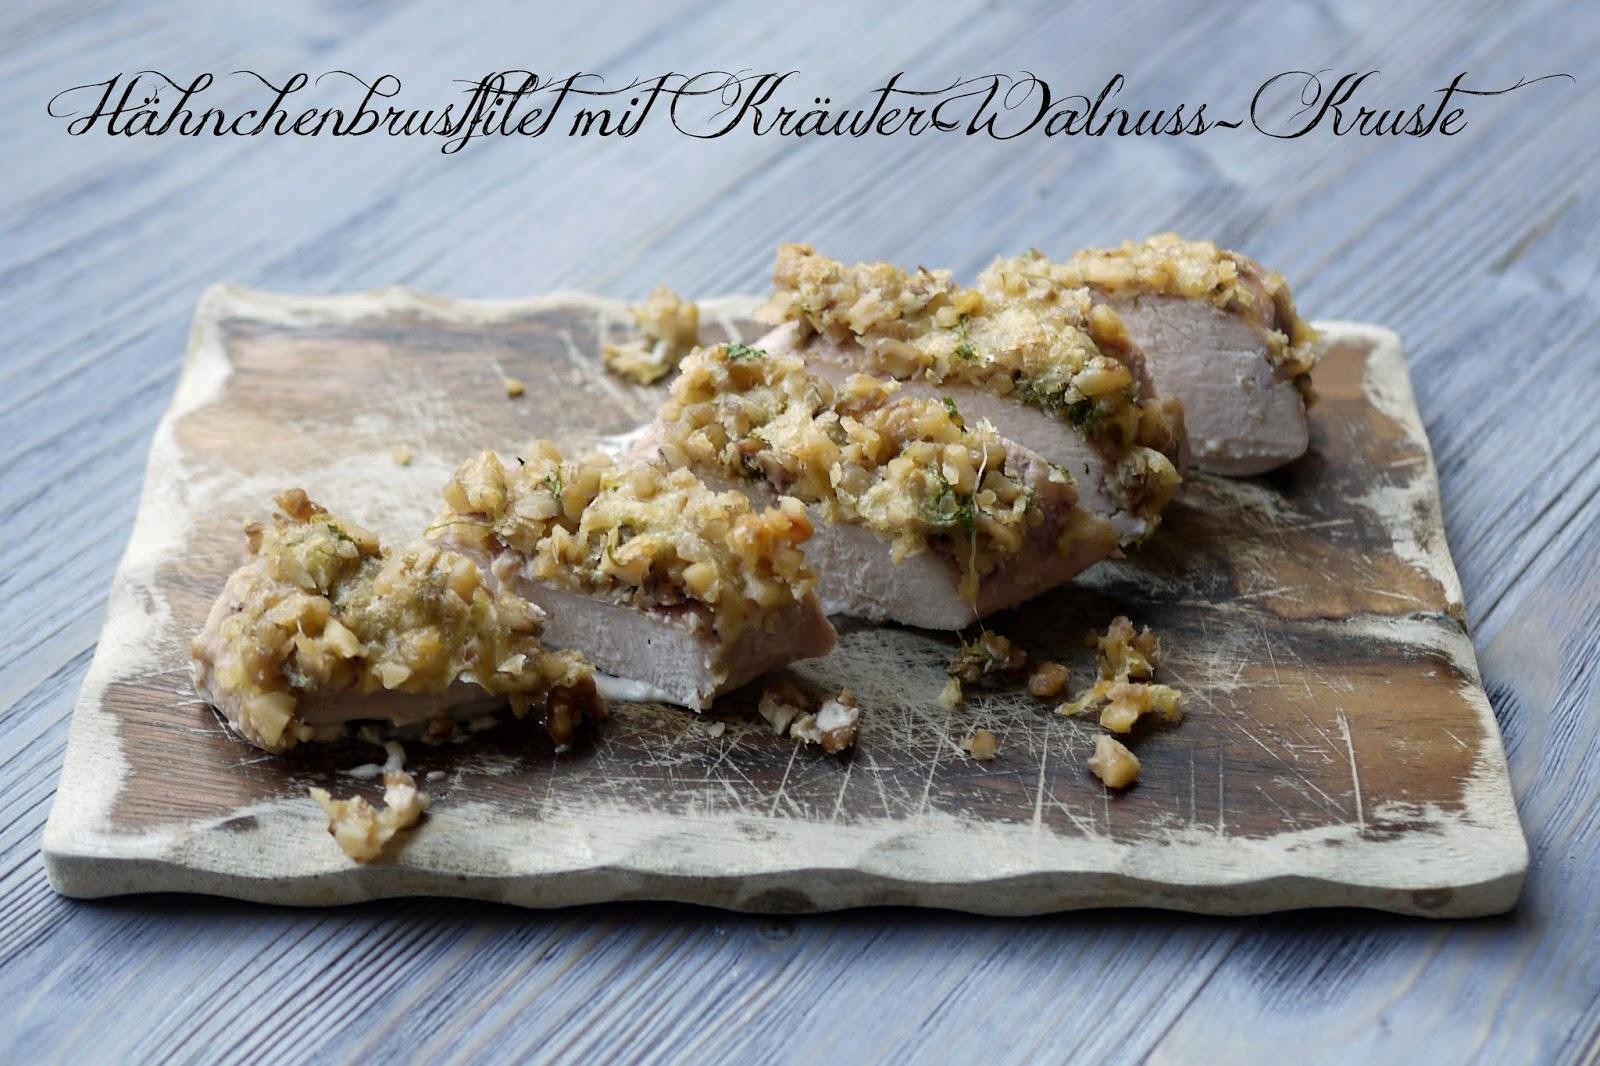 Hähnchenbrustfilets mit Kräuter-Walnuss-Kruste  | Rezept | Kochen | Essen